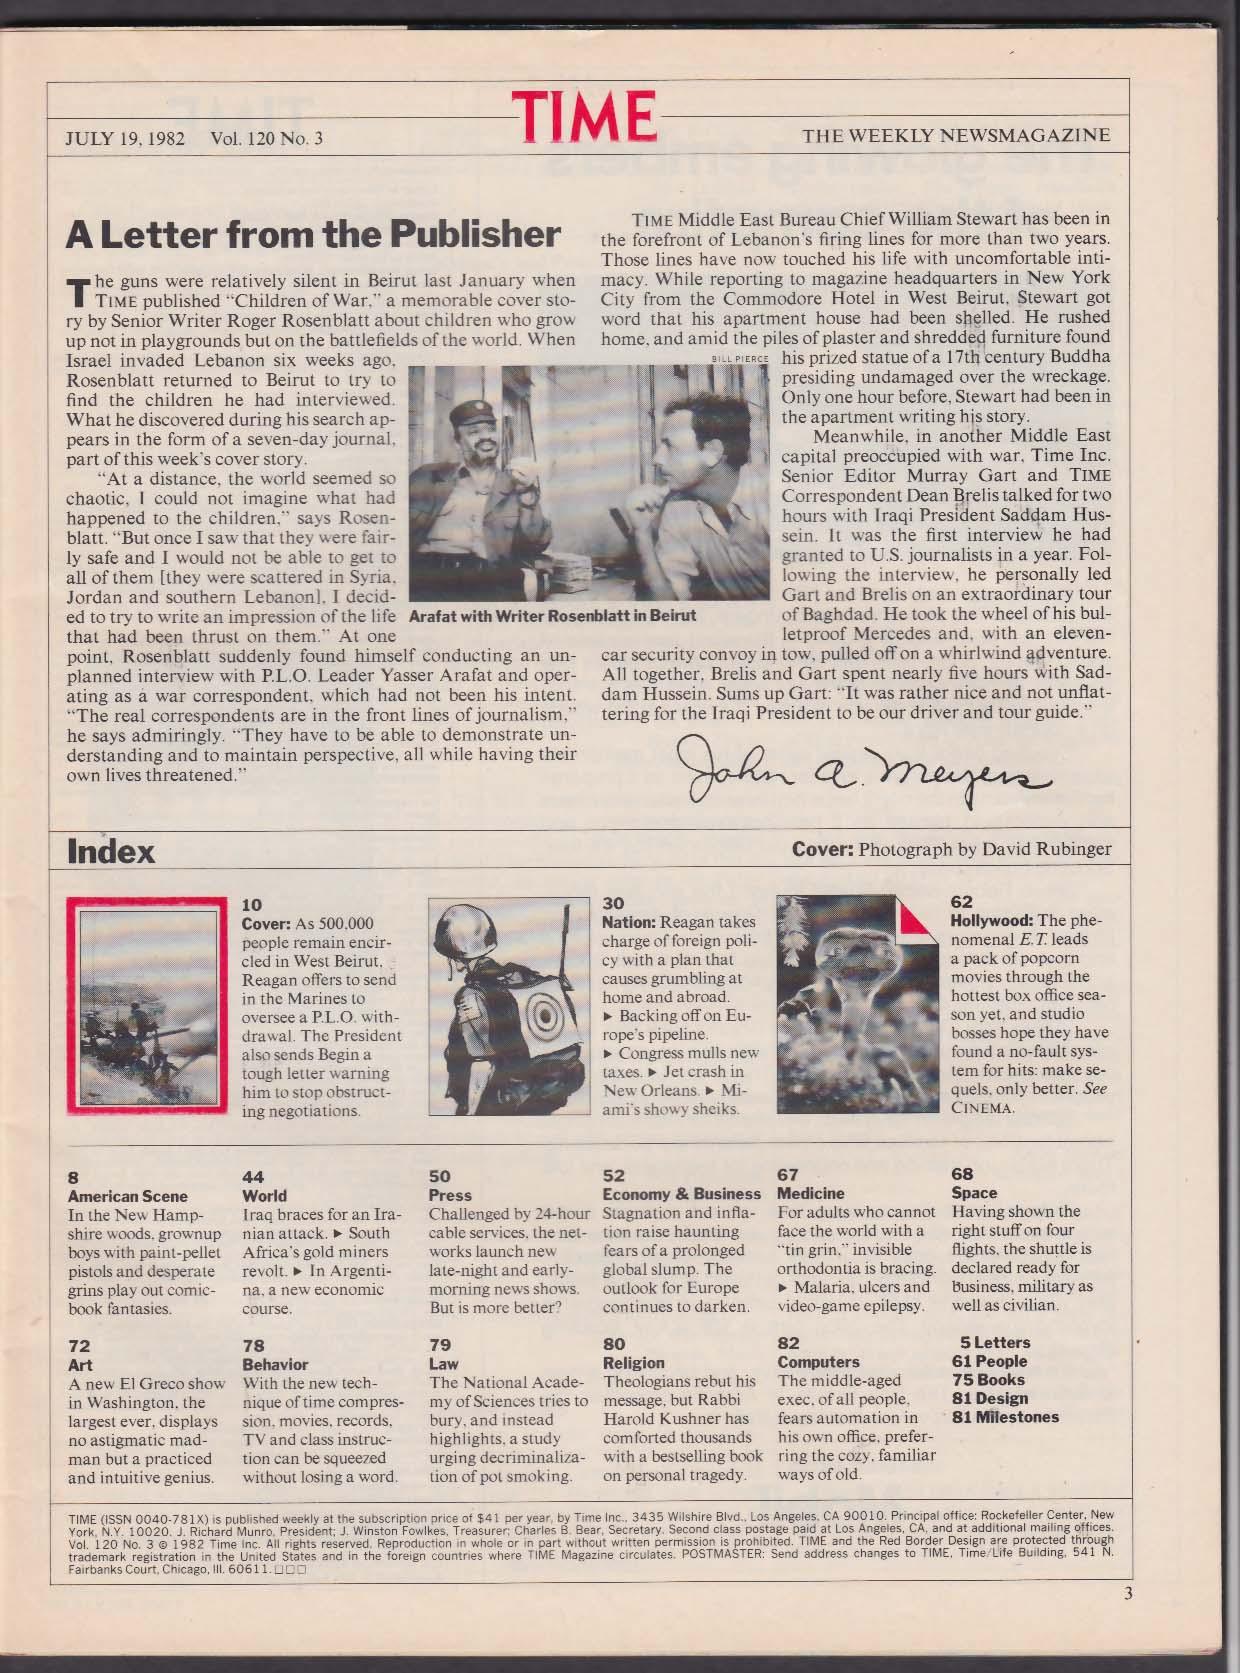 TIME Beirut Lebanon Arafat Begin Reagan Israel ET Extra-Terrestrial 7/19 1982